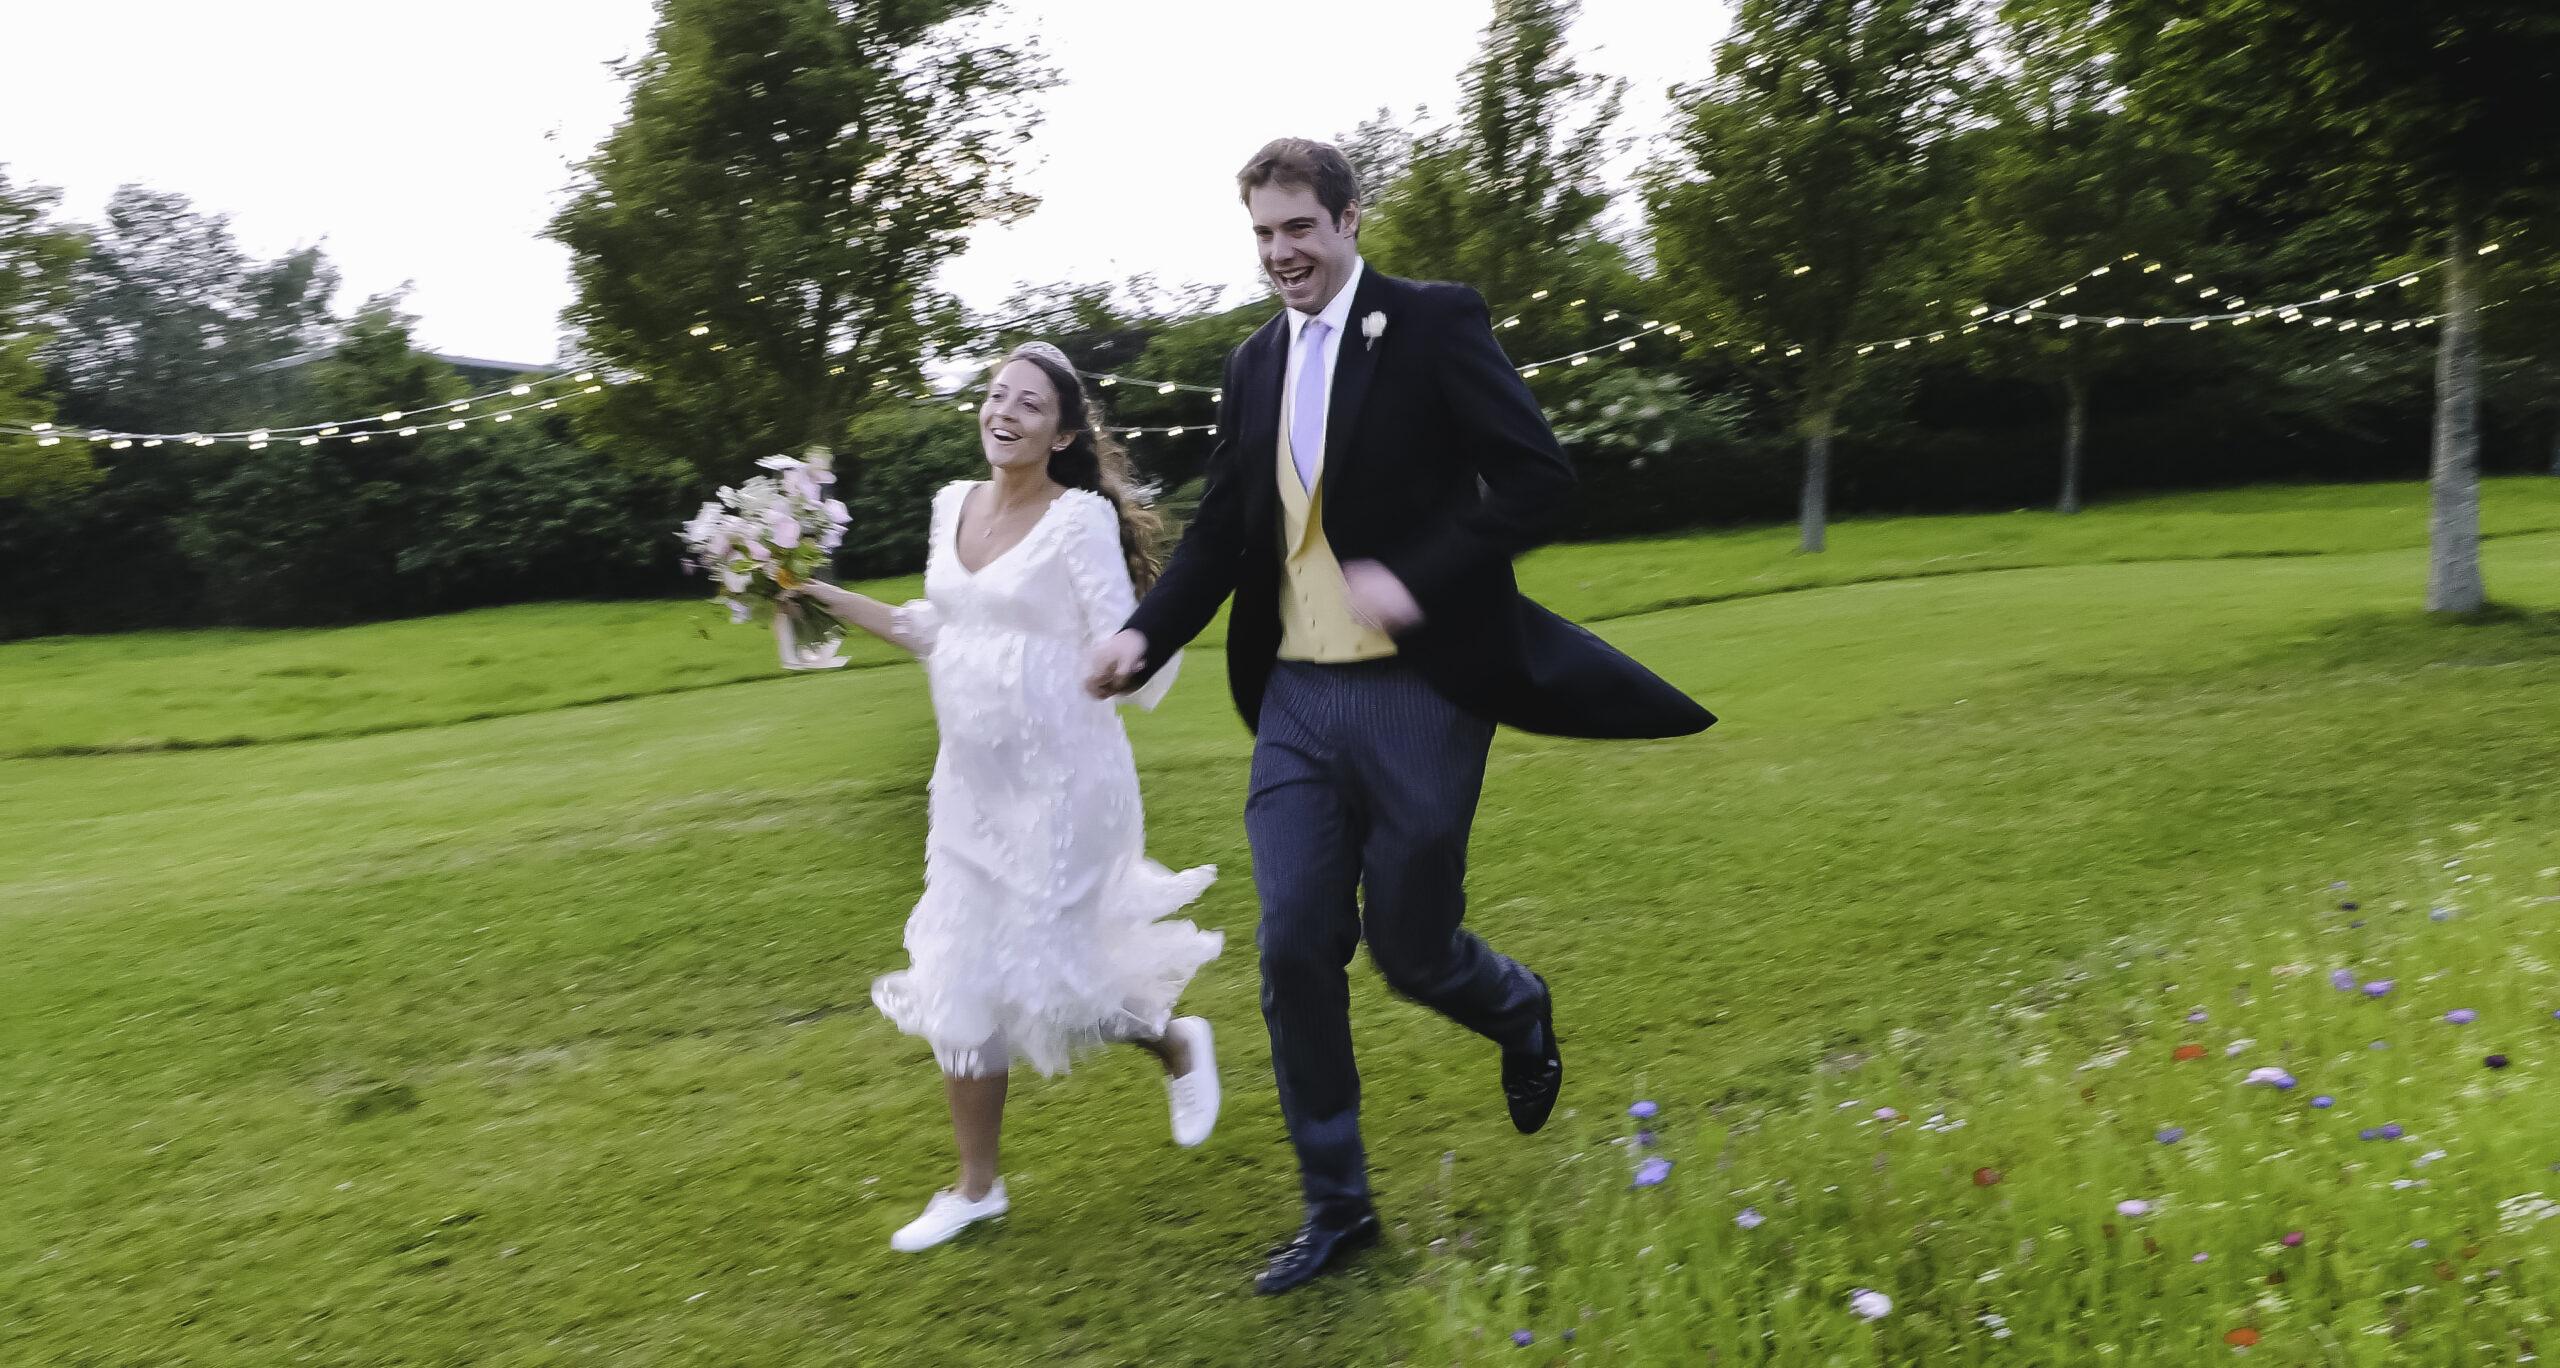 Wedding Videography Wedding Photography St Helens Church Ainderby Steeple Northallerton